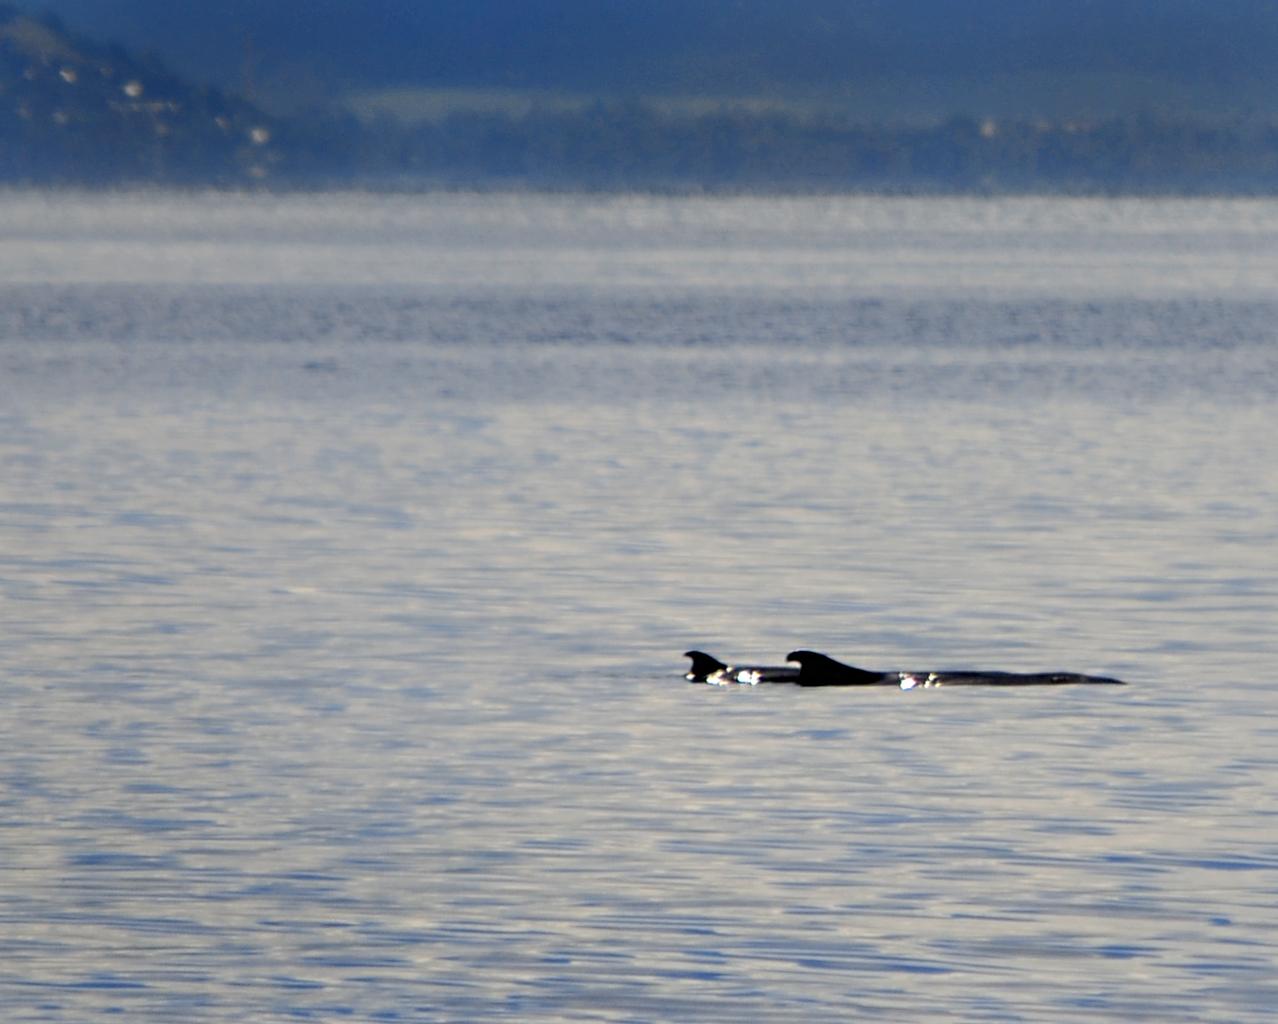 pygmy-sperm-whales-by-gregg-yan2.jpg